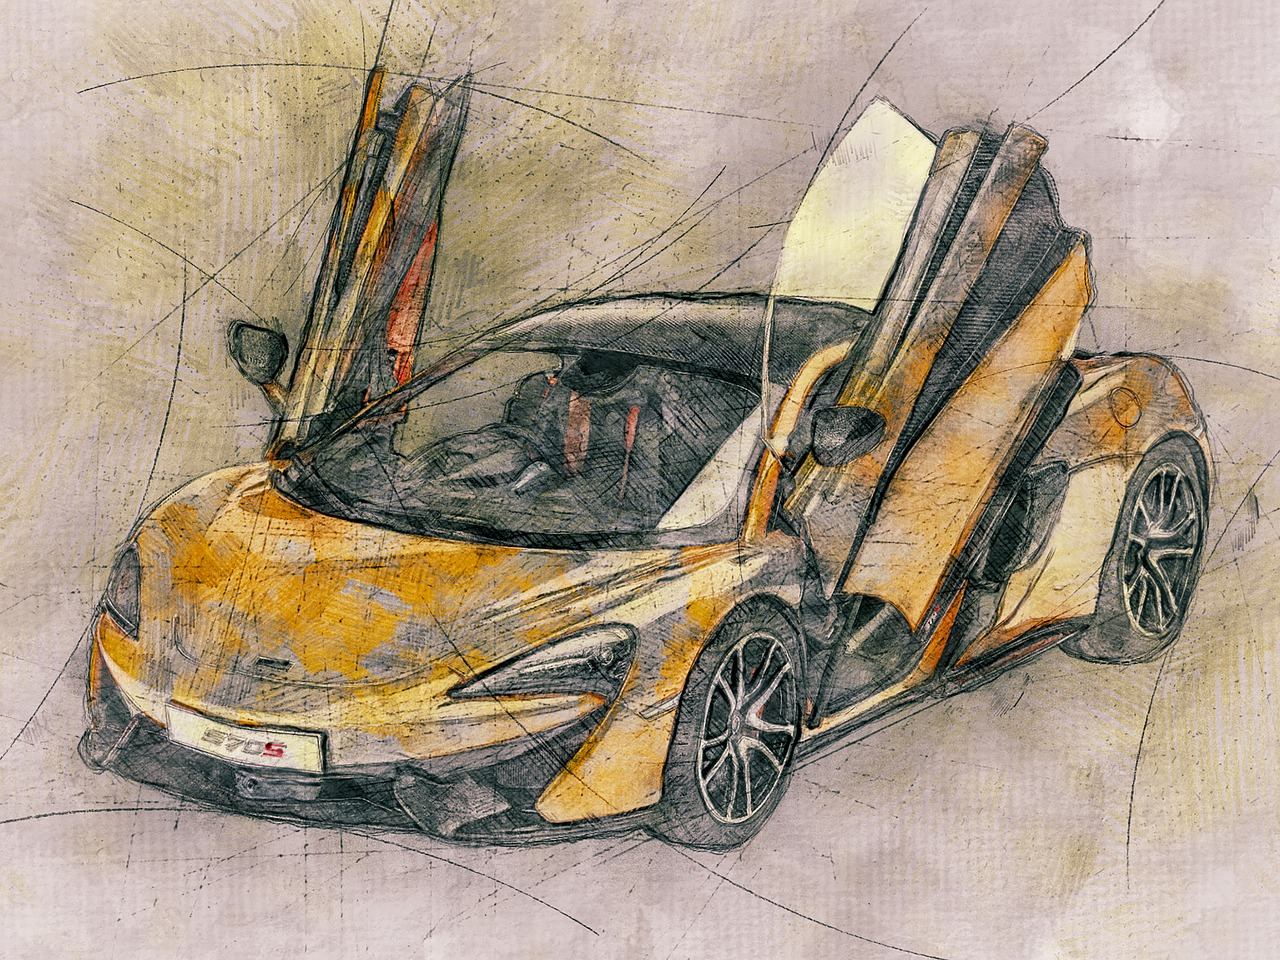 Auto Model Mobil Mclaren 570s Gambar Gratis Di Pixabay